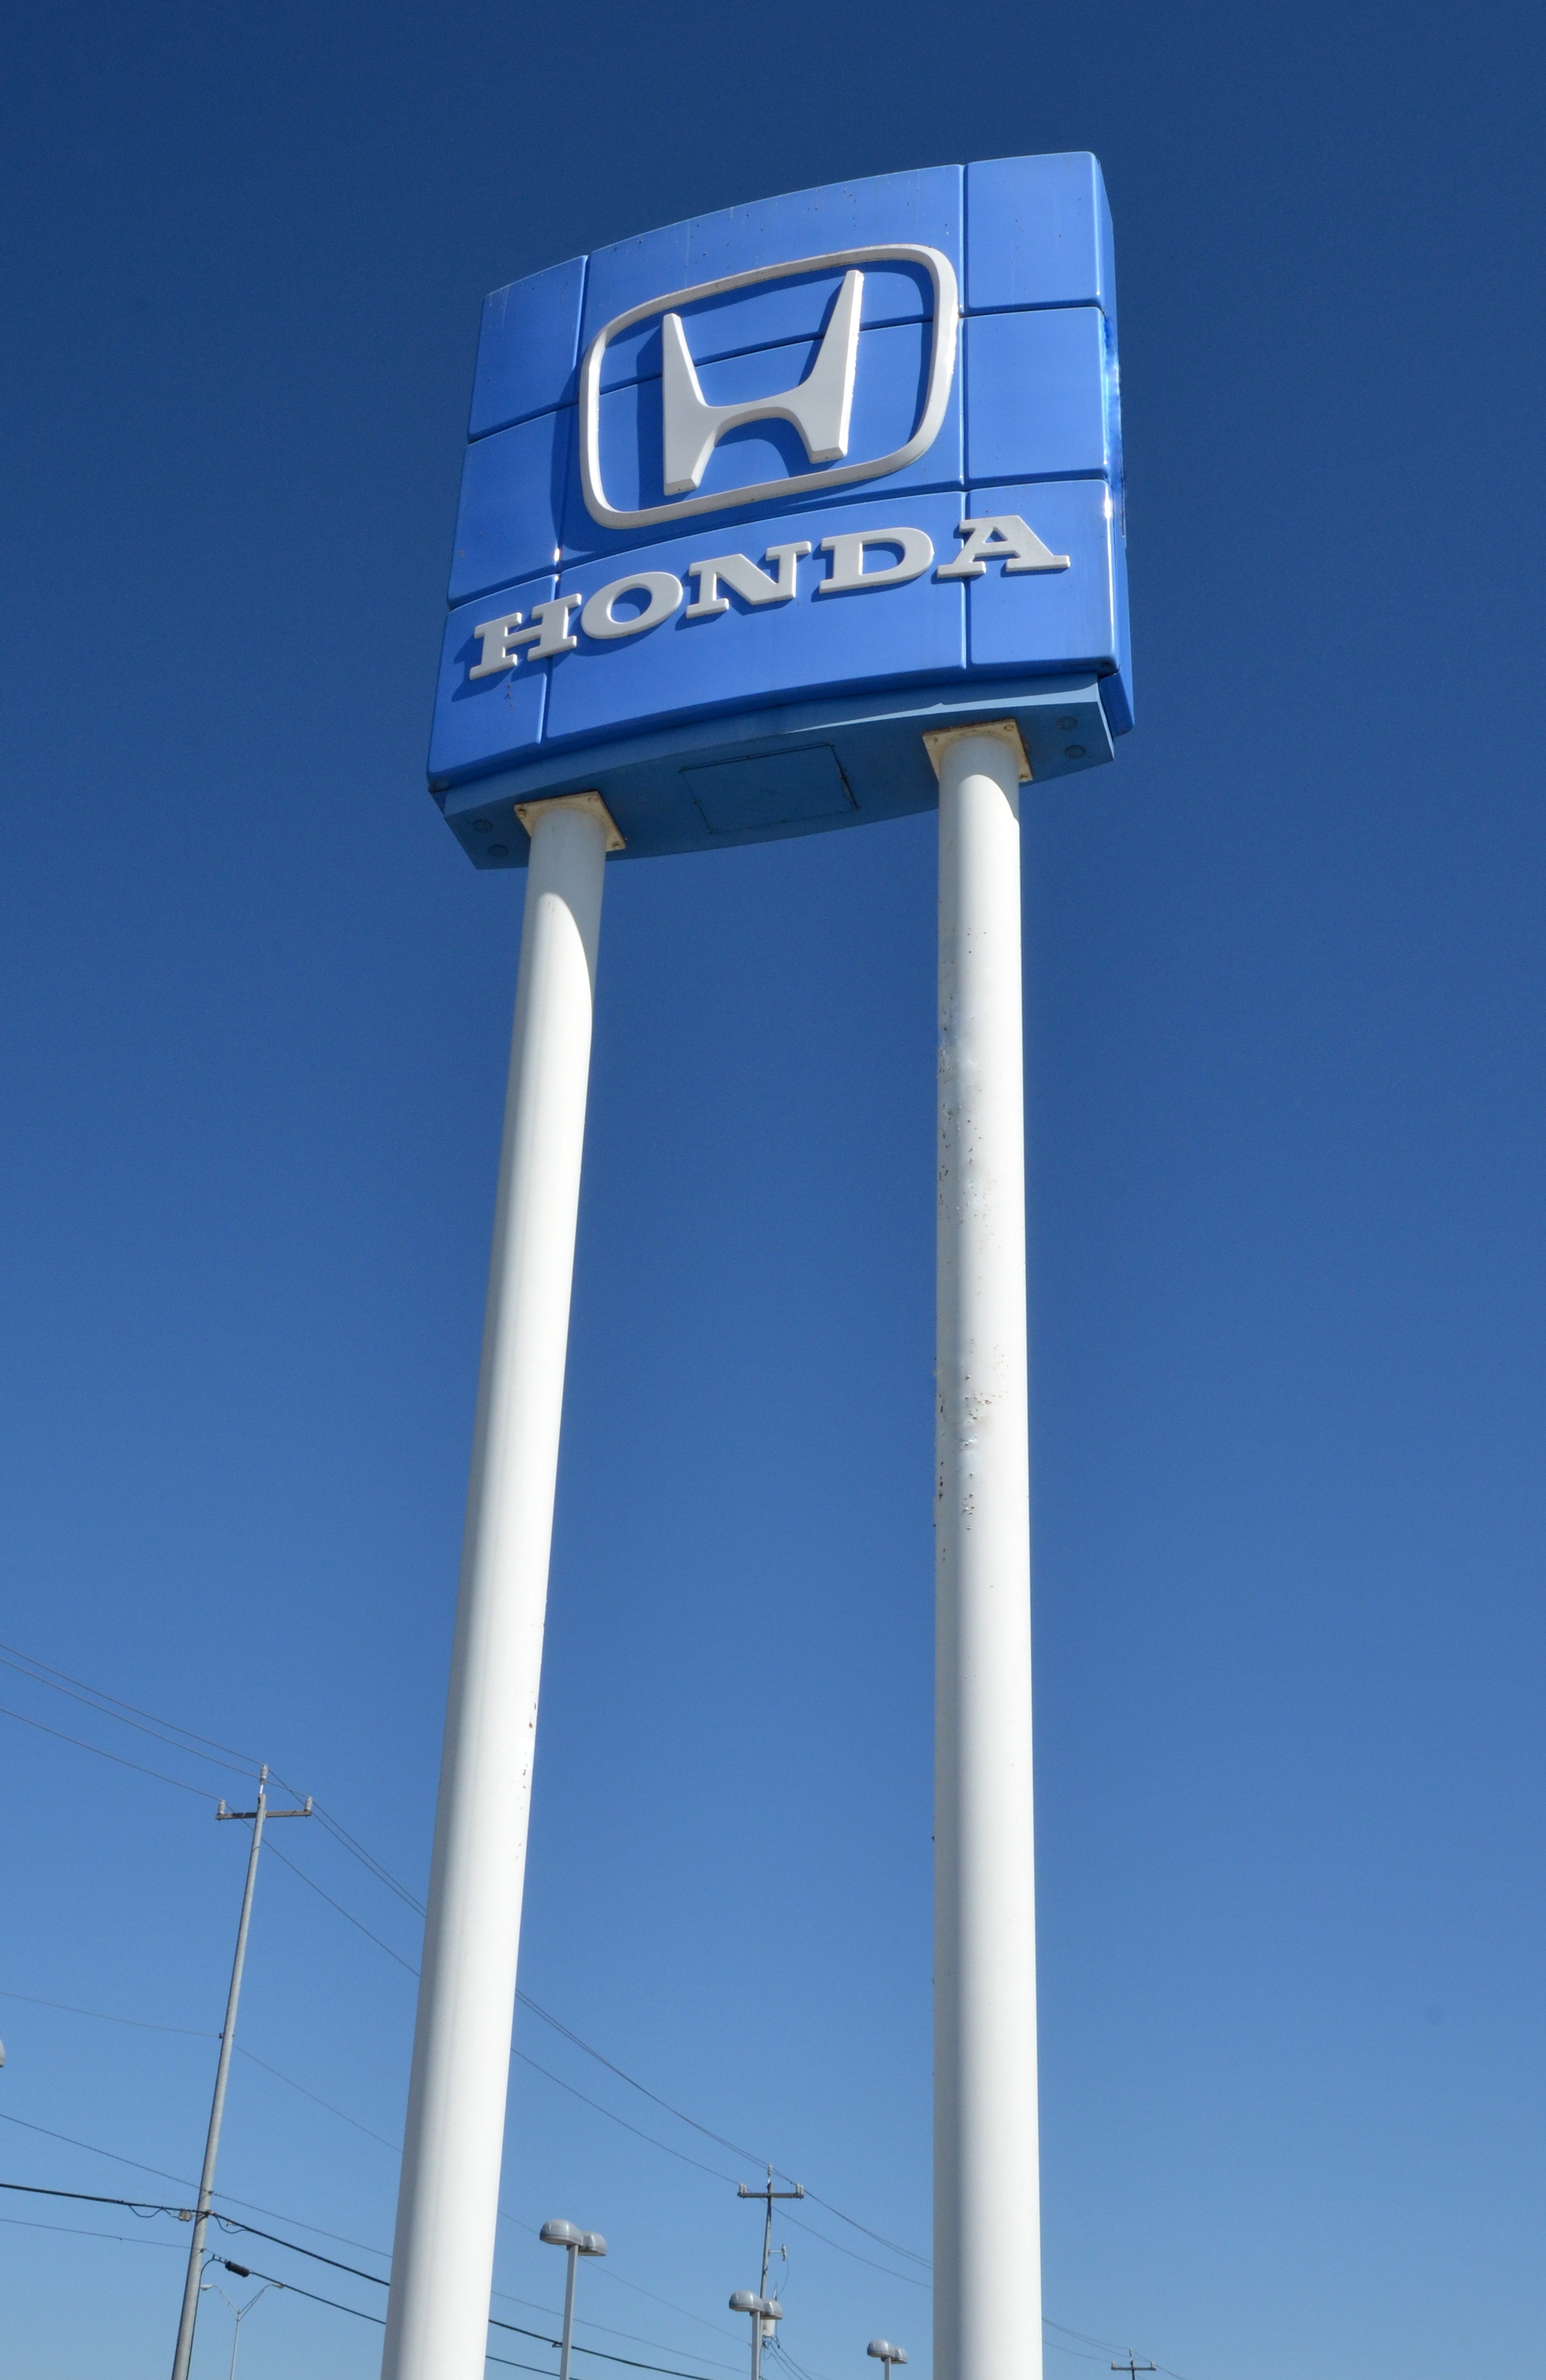 Gillman Honda San Antonio 16044 Interstate 35 North Selma, TX Auto Dealers    MapQuest